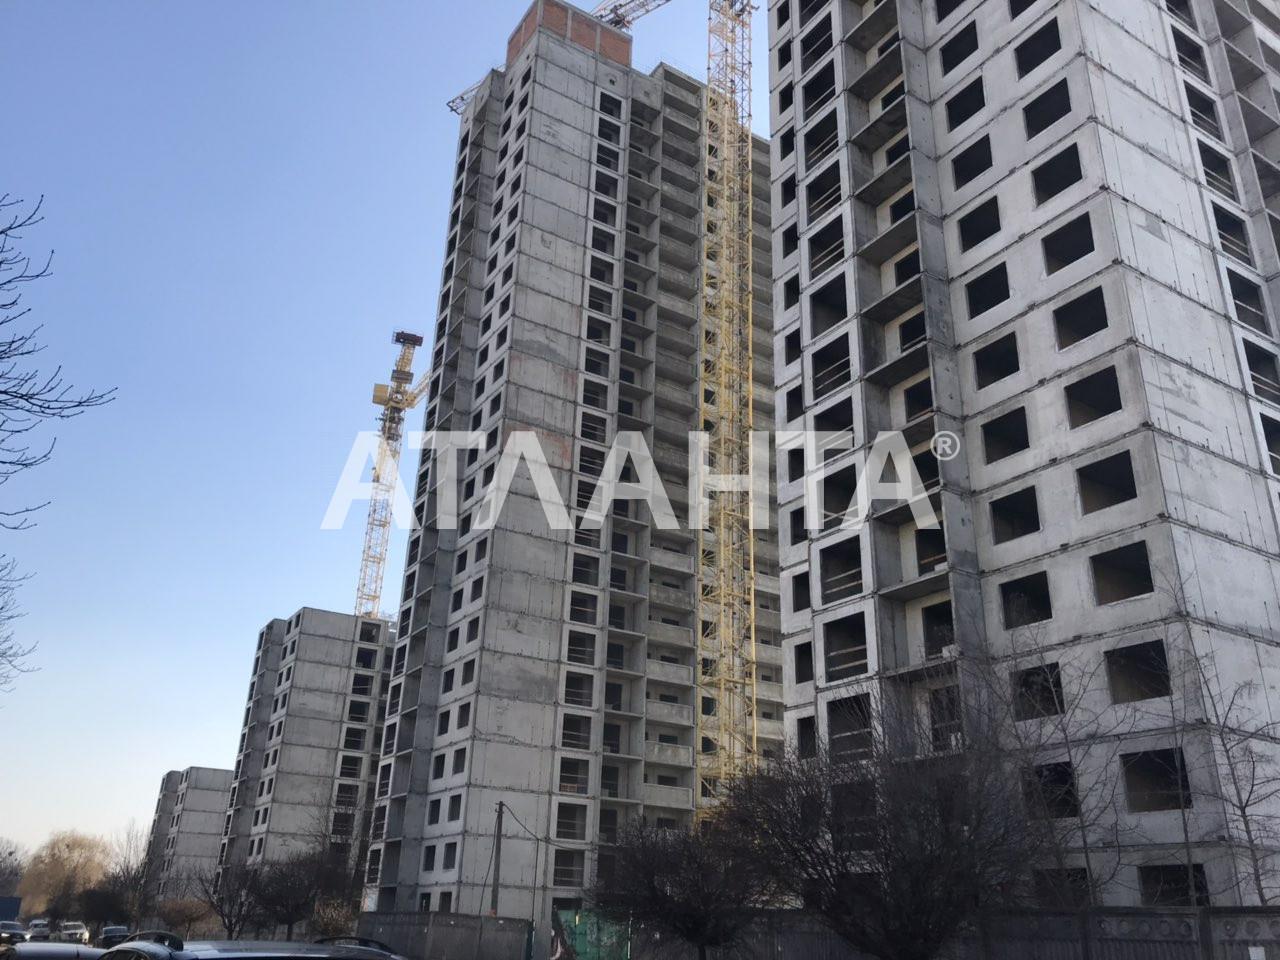 Продается 1-комнатная Квартира на ул. Просп. Глушкова — 32 500 000 у.е. (фото №2)